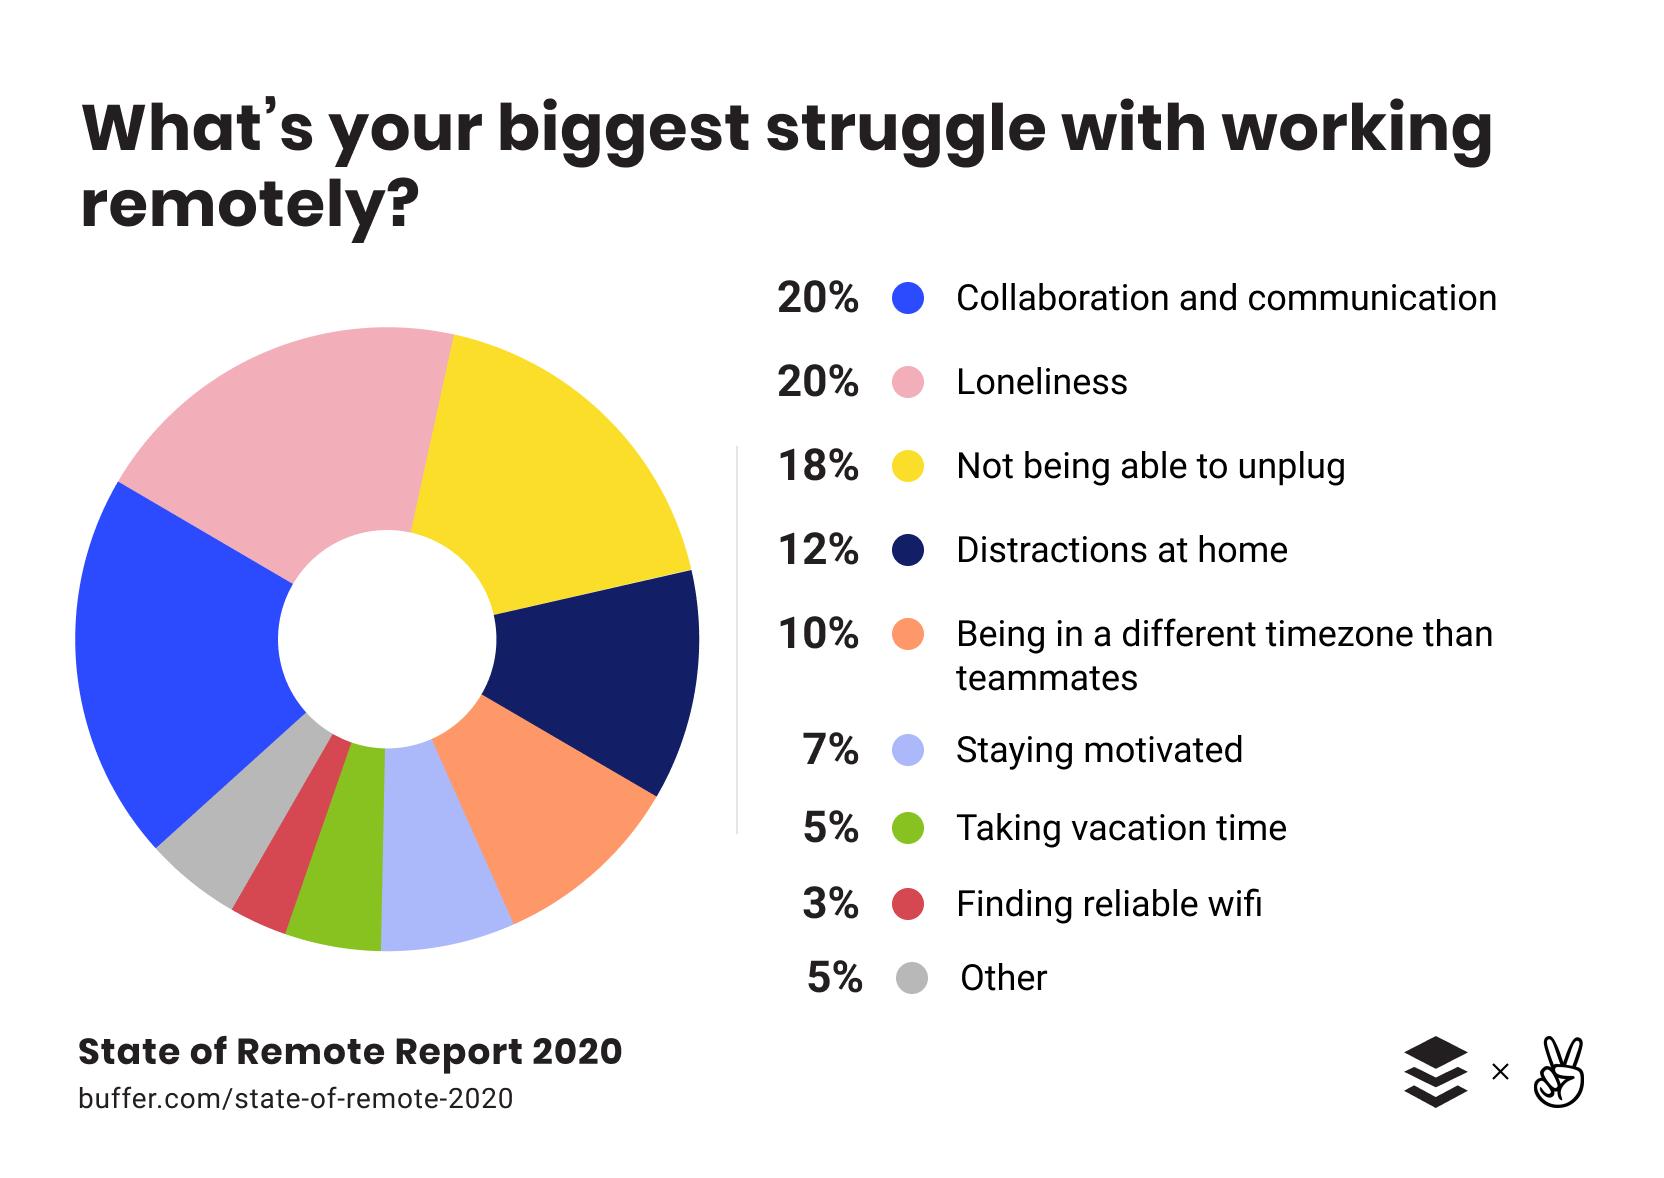 Source: buffer.com/state-of-remote-work-2020